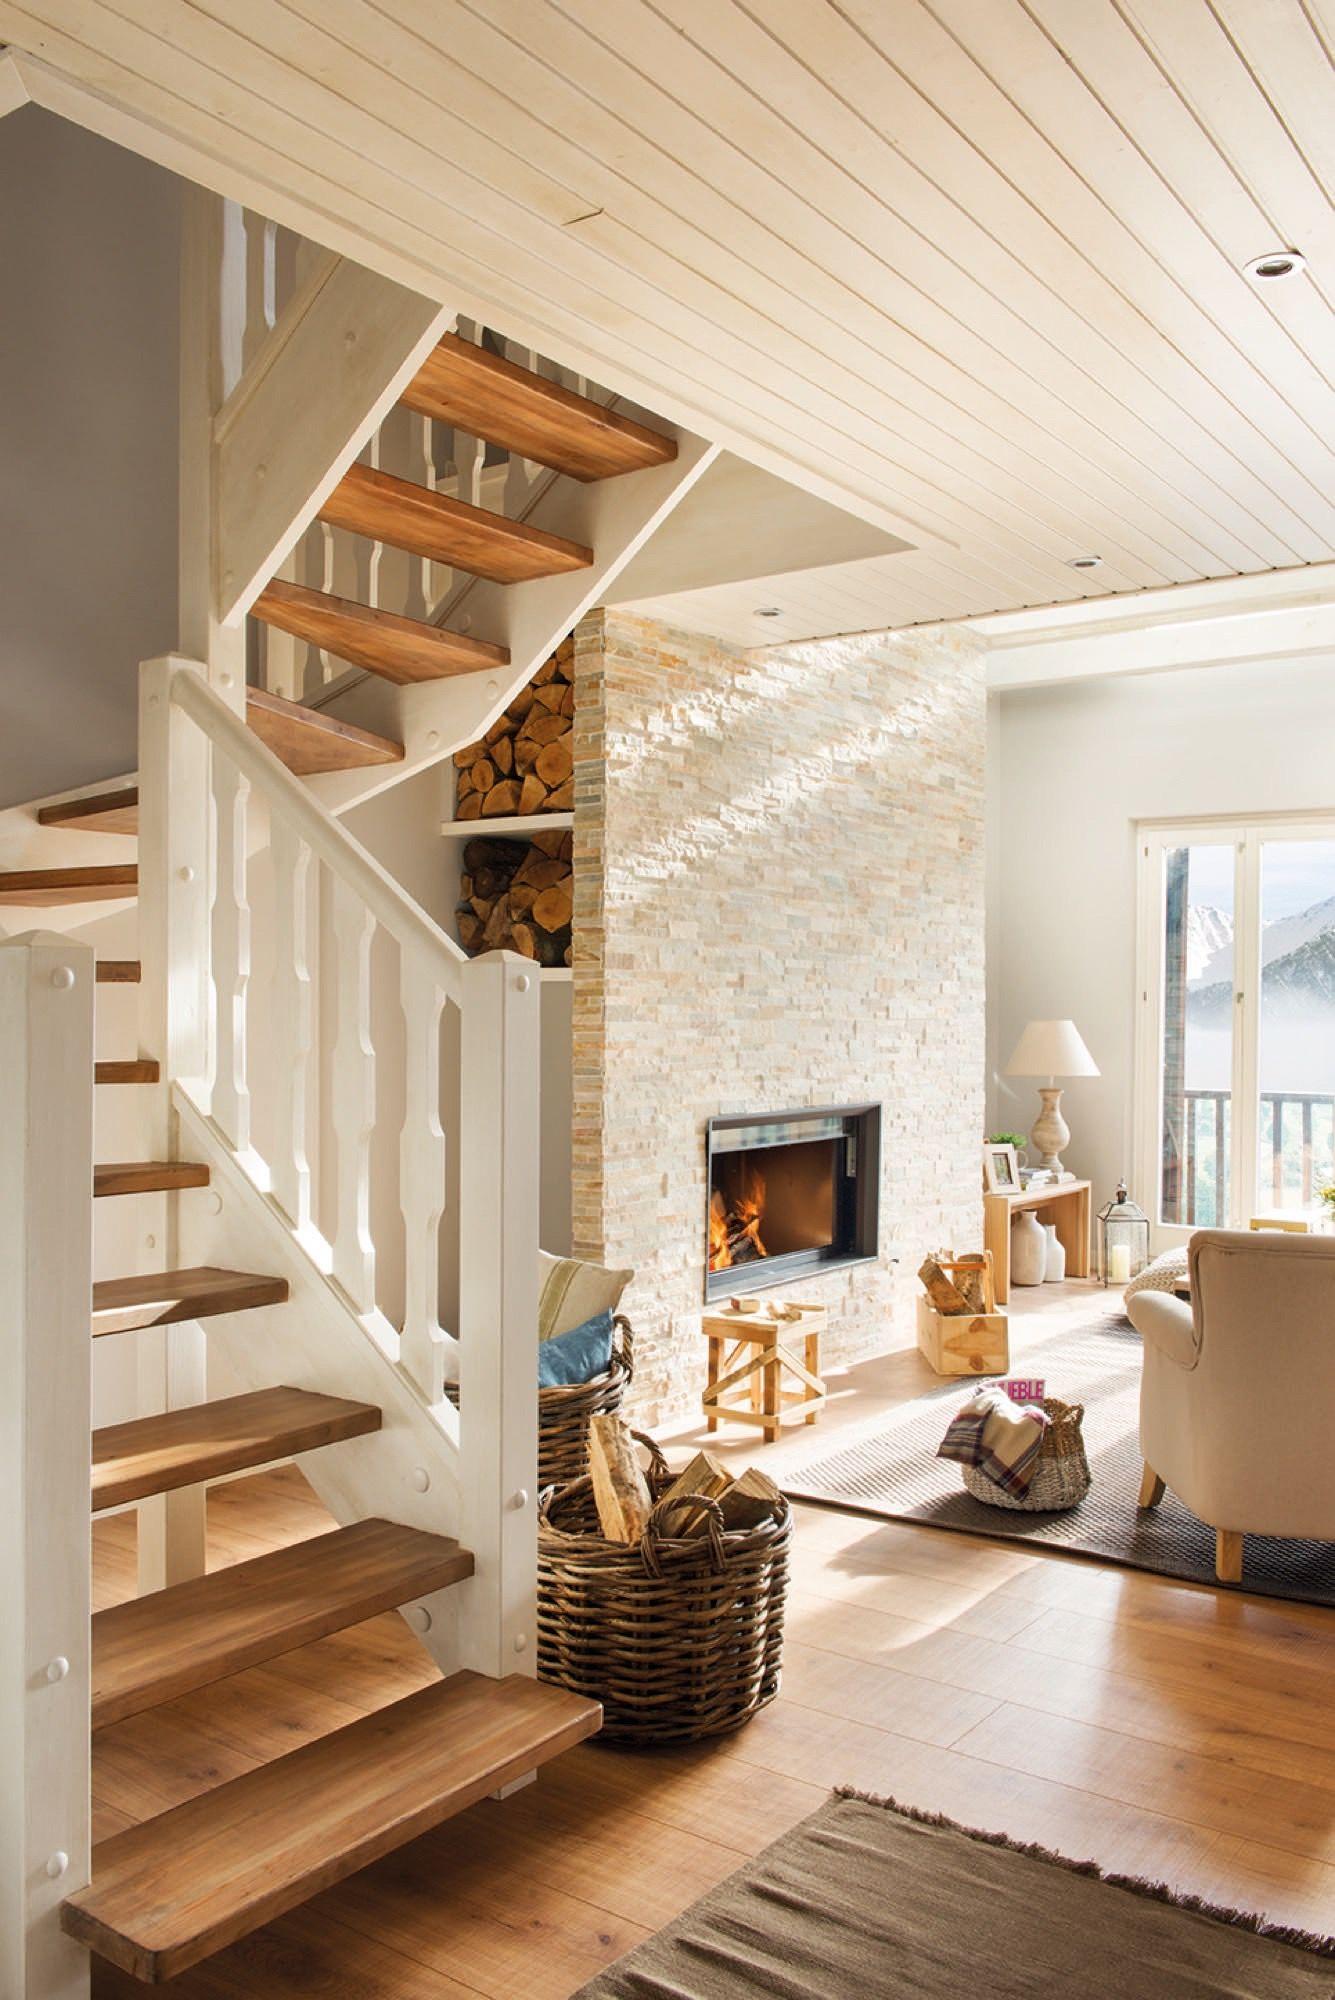 Escalera y chimenea en un piso de monta a caba a blanca for Decoracion piso montana